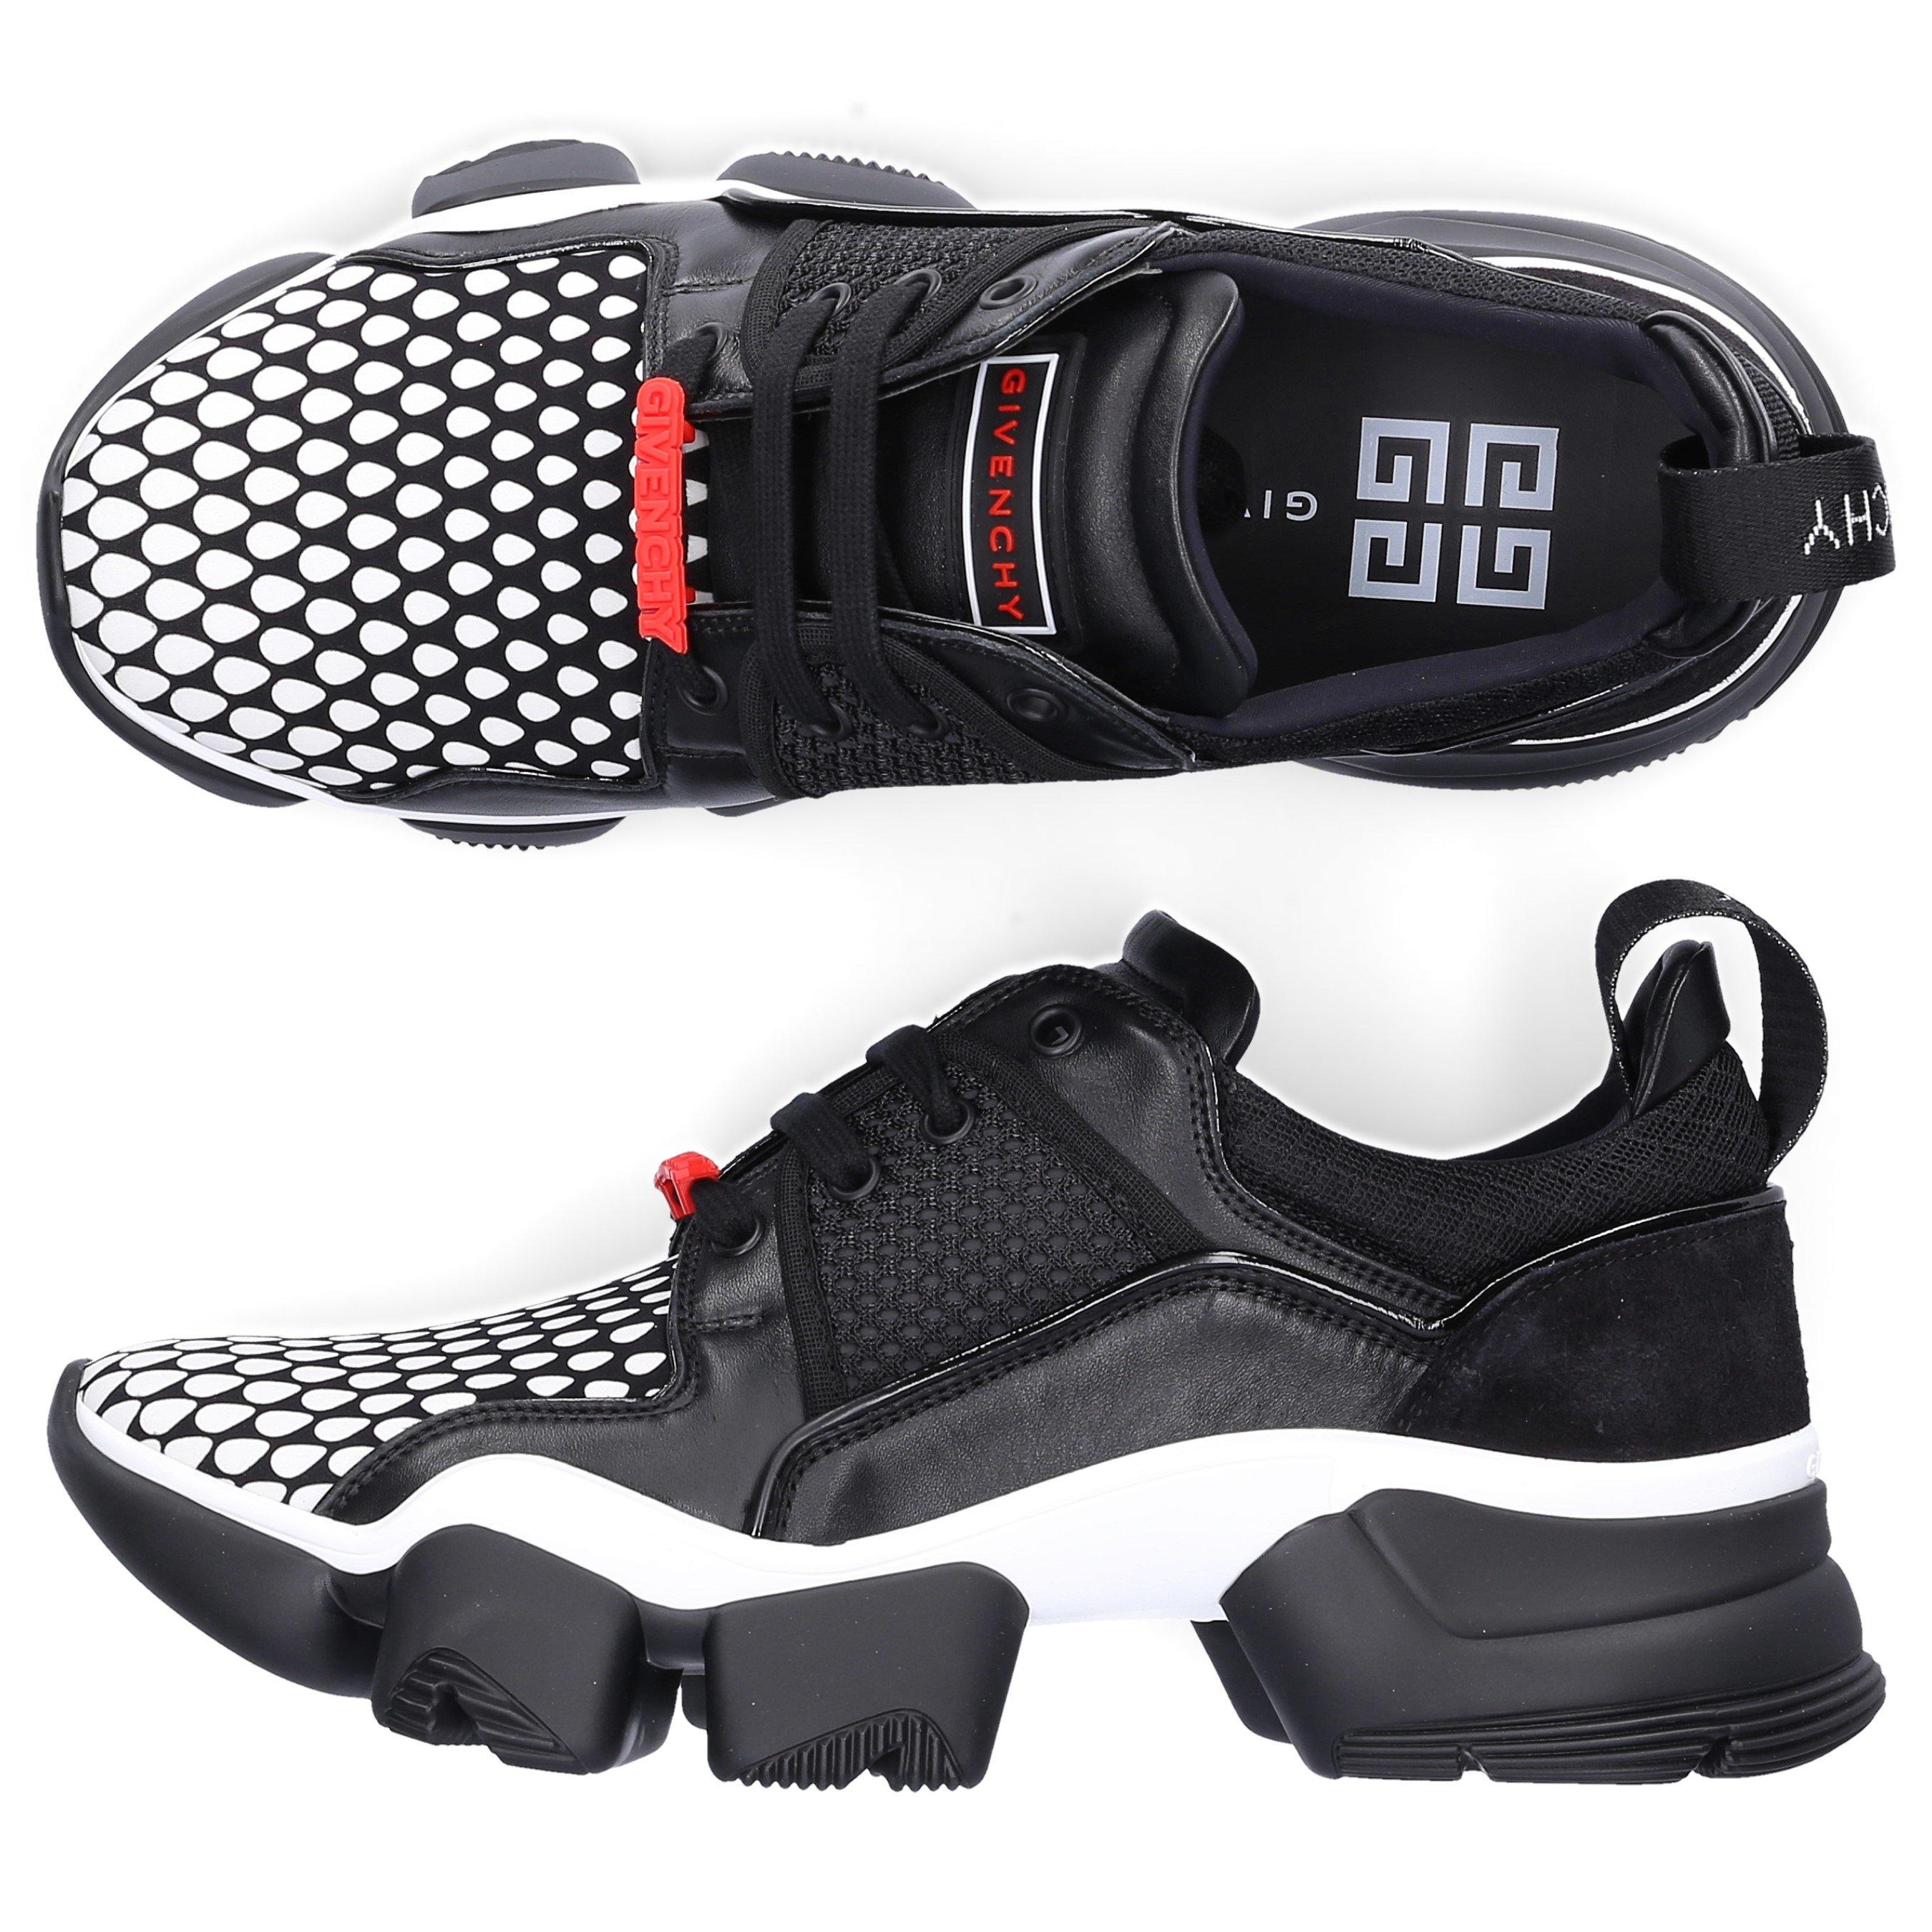 Givenchy Platforms LOW-TOP SNEAKERS JAW SNEAKER  CALFSKIN NEOPRENE LOGO BLACK-COMBO